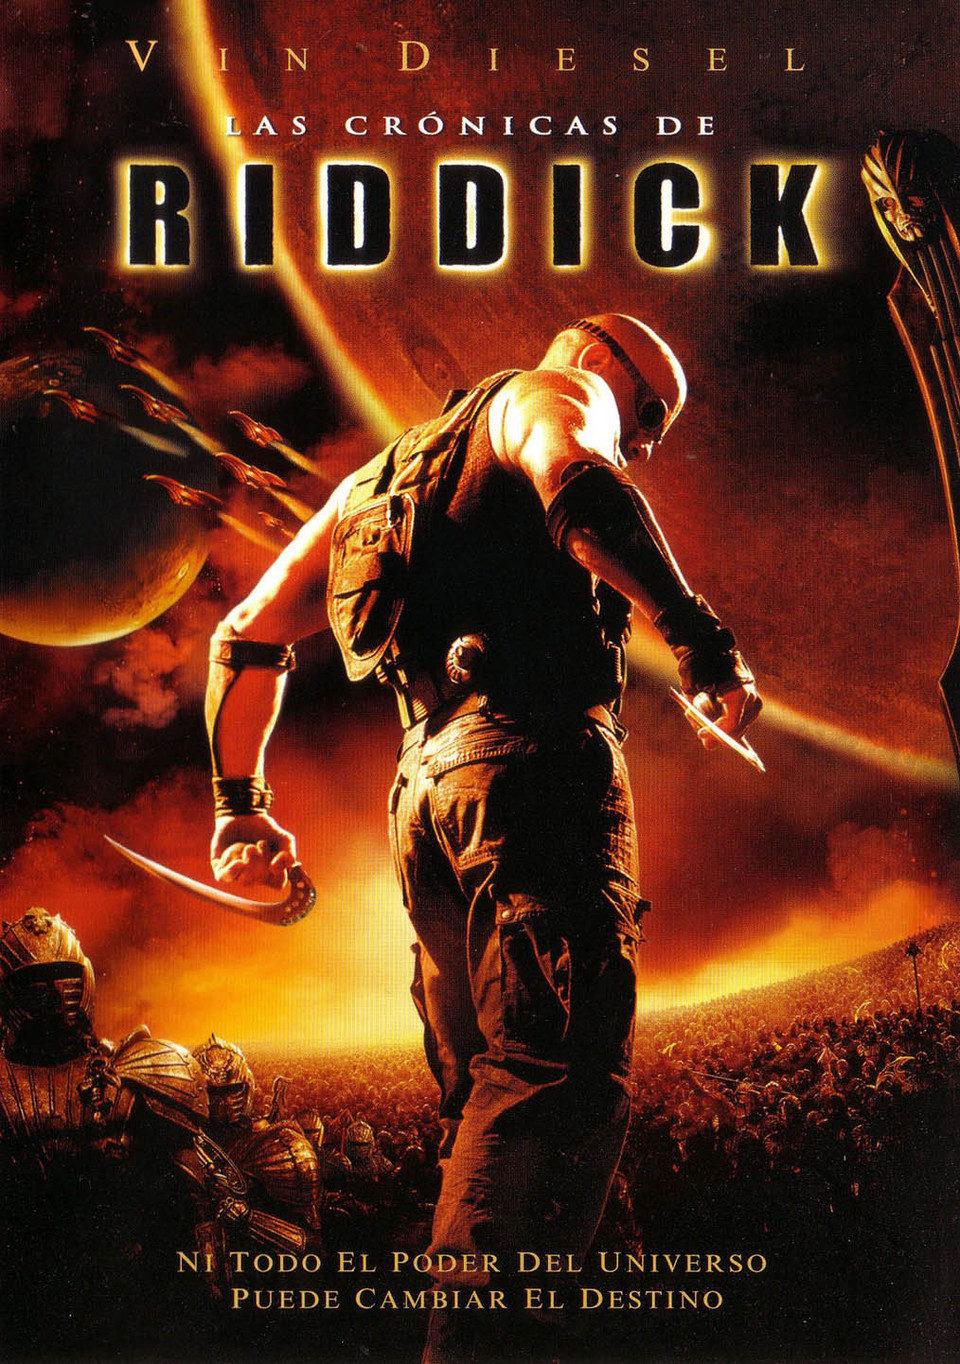 Cartel España de 'Las crónicas de Riddick'